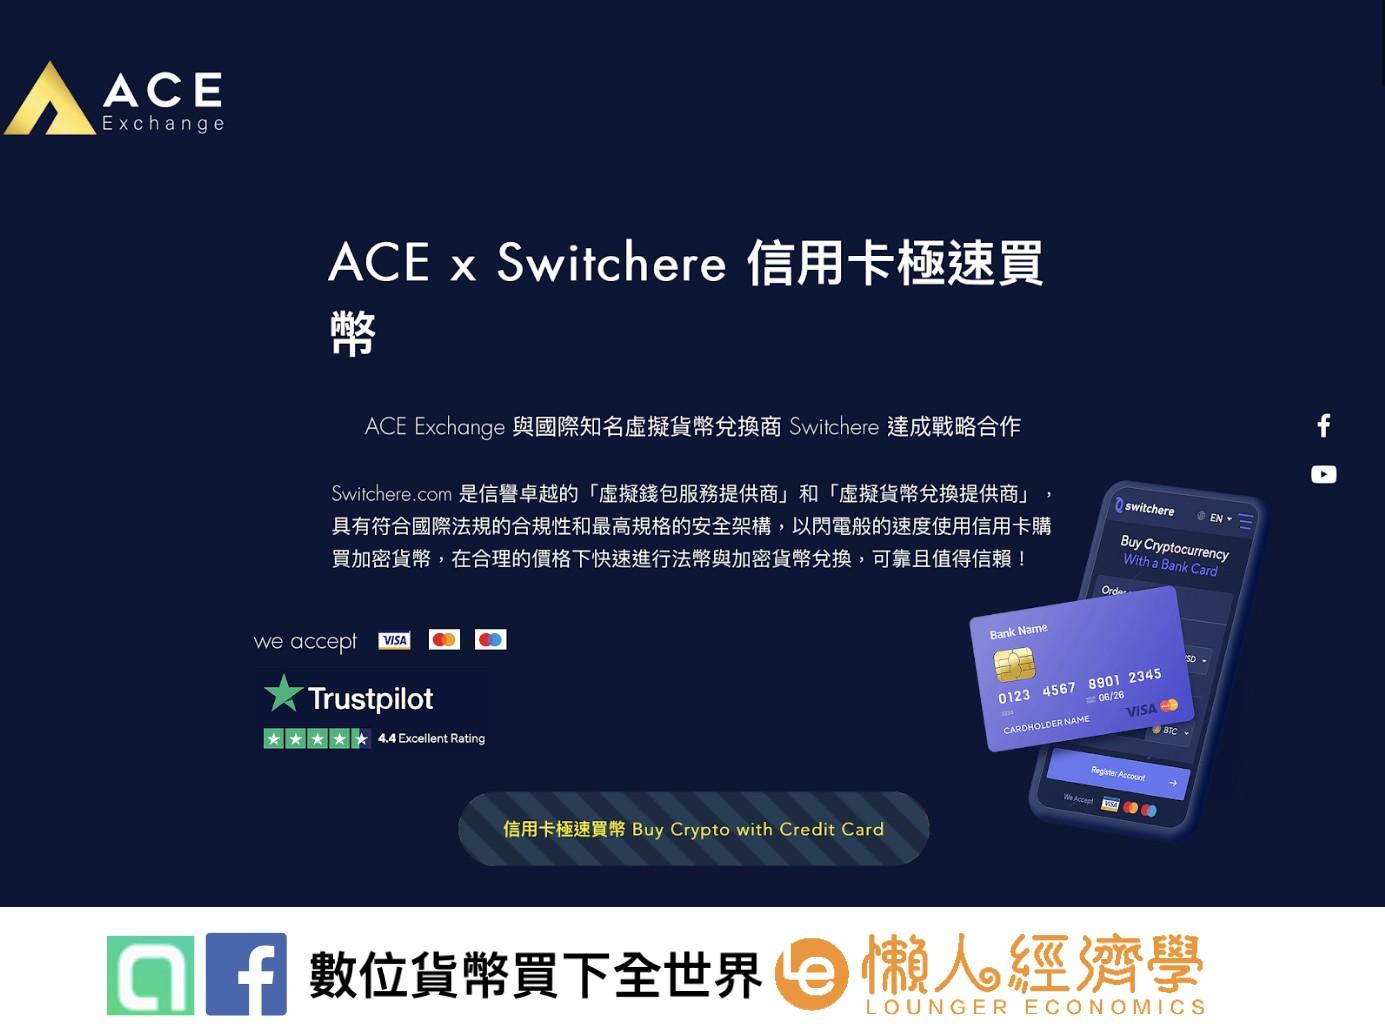 ACE x Switchere 信用卡極速買幣